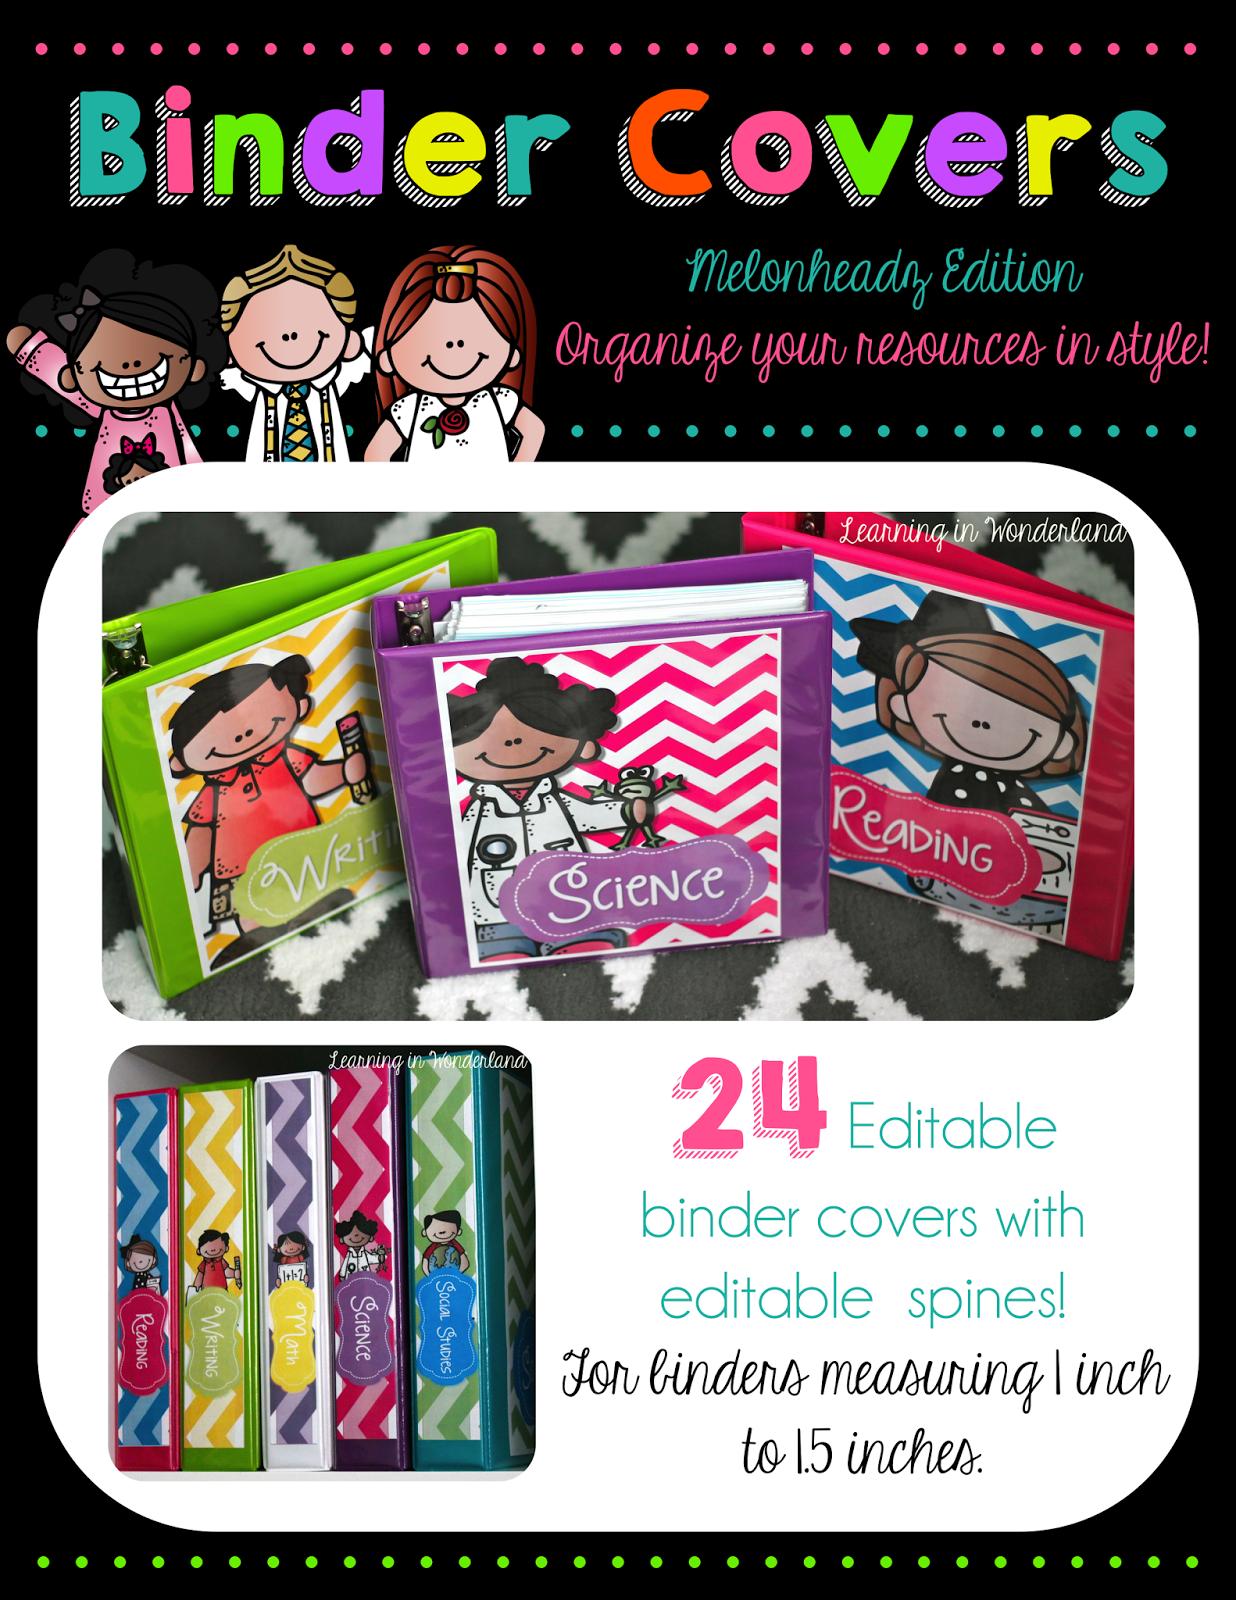 http://www.teacherspayteachers.com/Product/Lets-Get-Organized-Melonheadz-Kids-Edition-Teacher-Toolbox-and-More-1270171